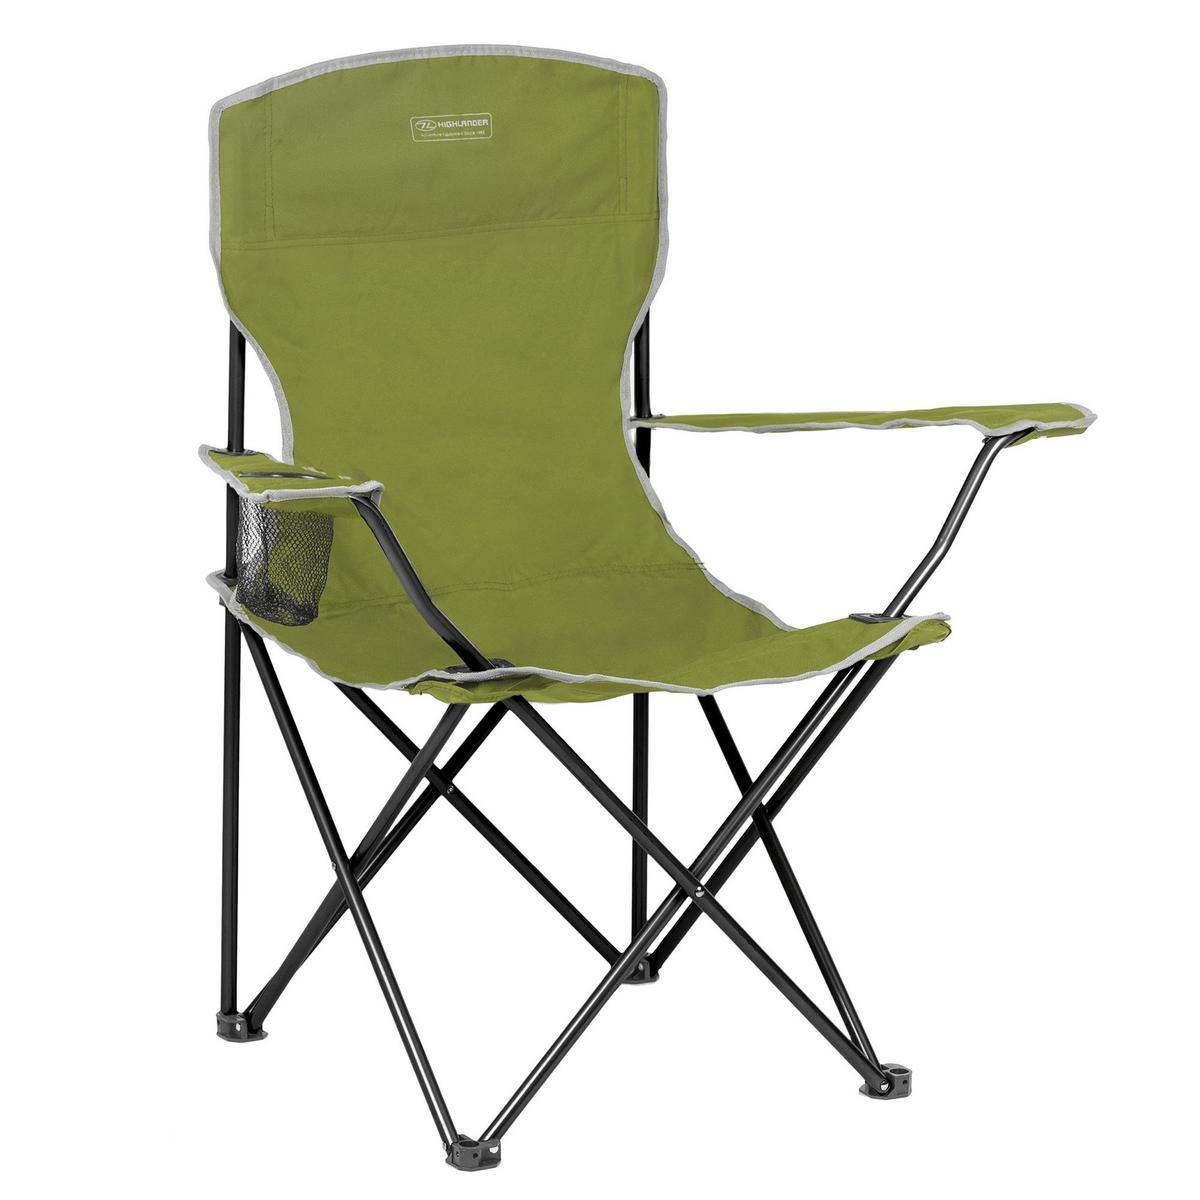 Highlander Traquair Folding Chair - Green